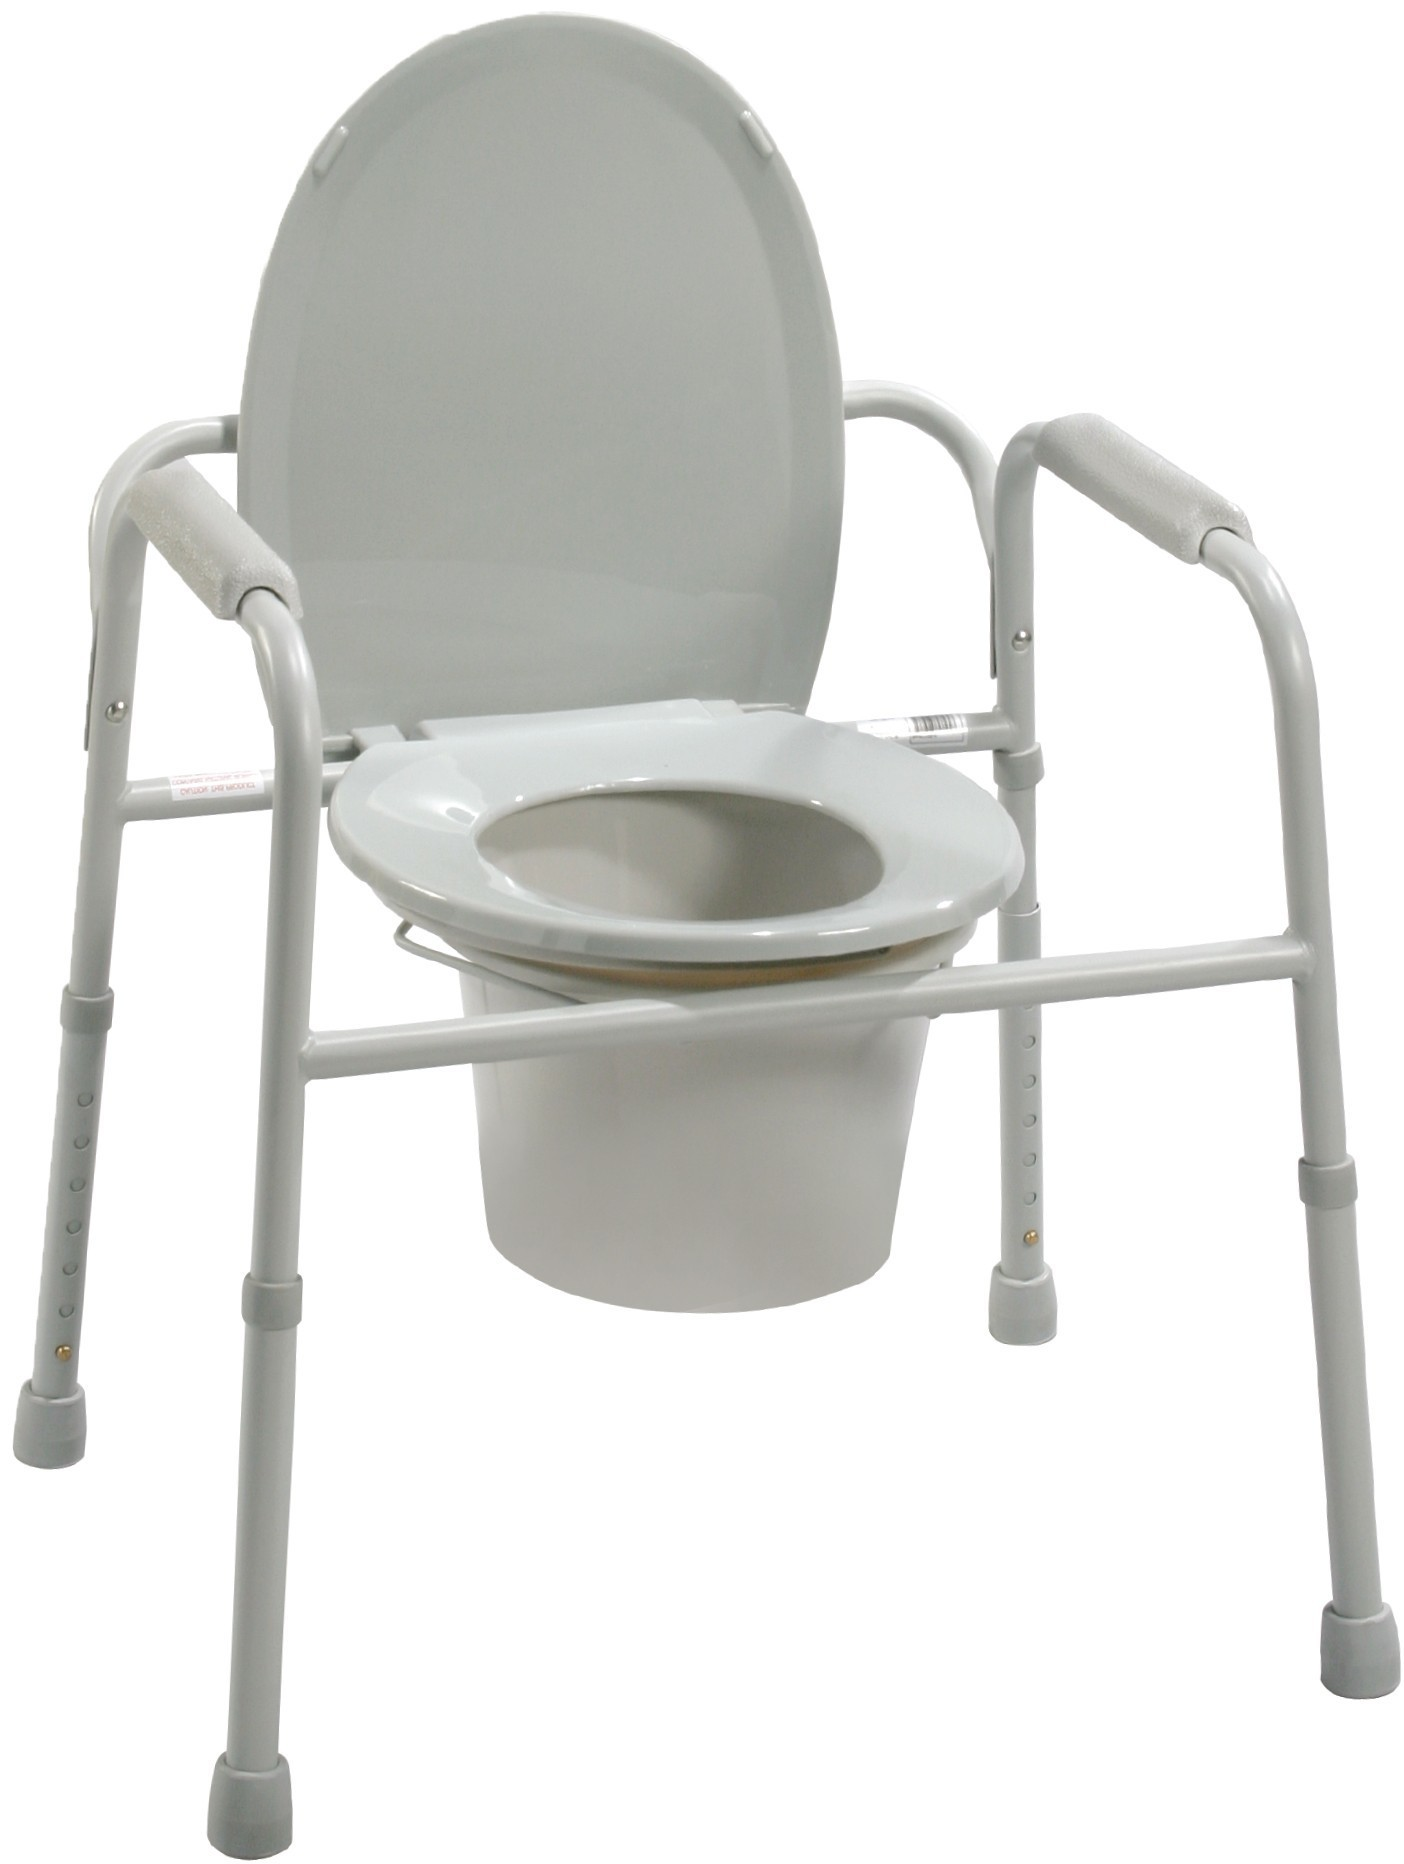 Bathroom Equipment/Accessories | Tonka Medical Supplies